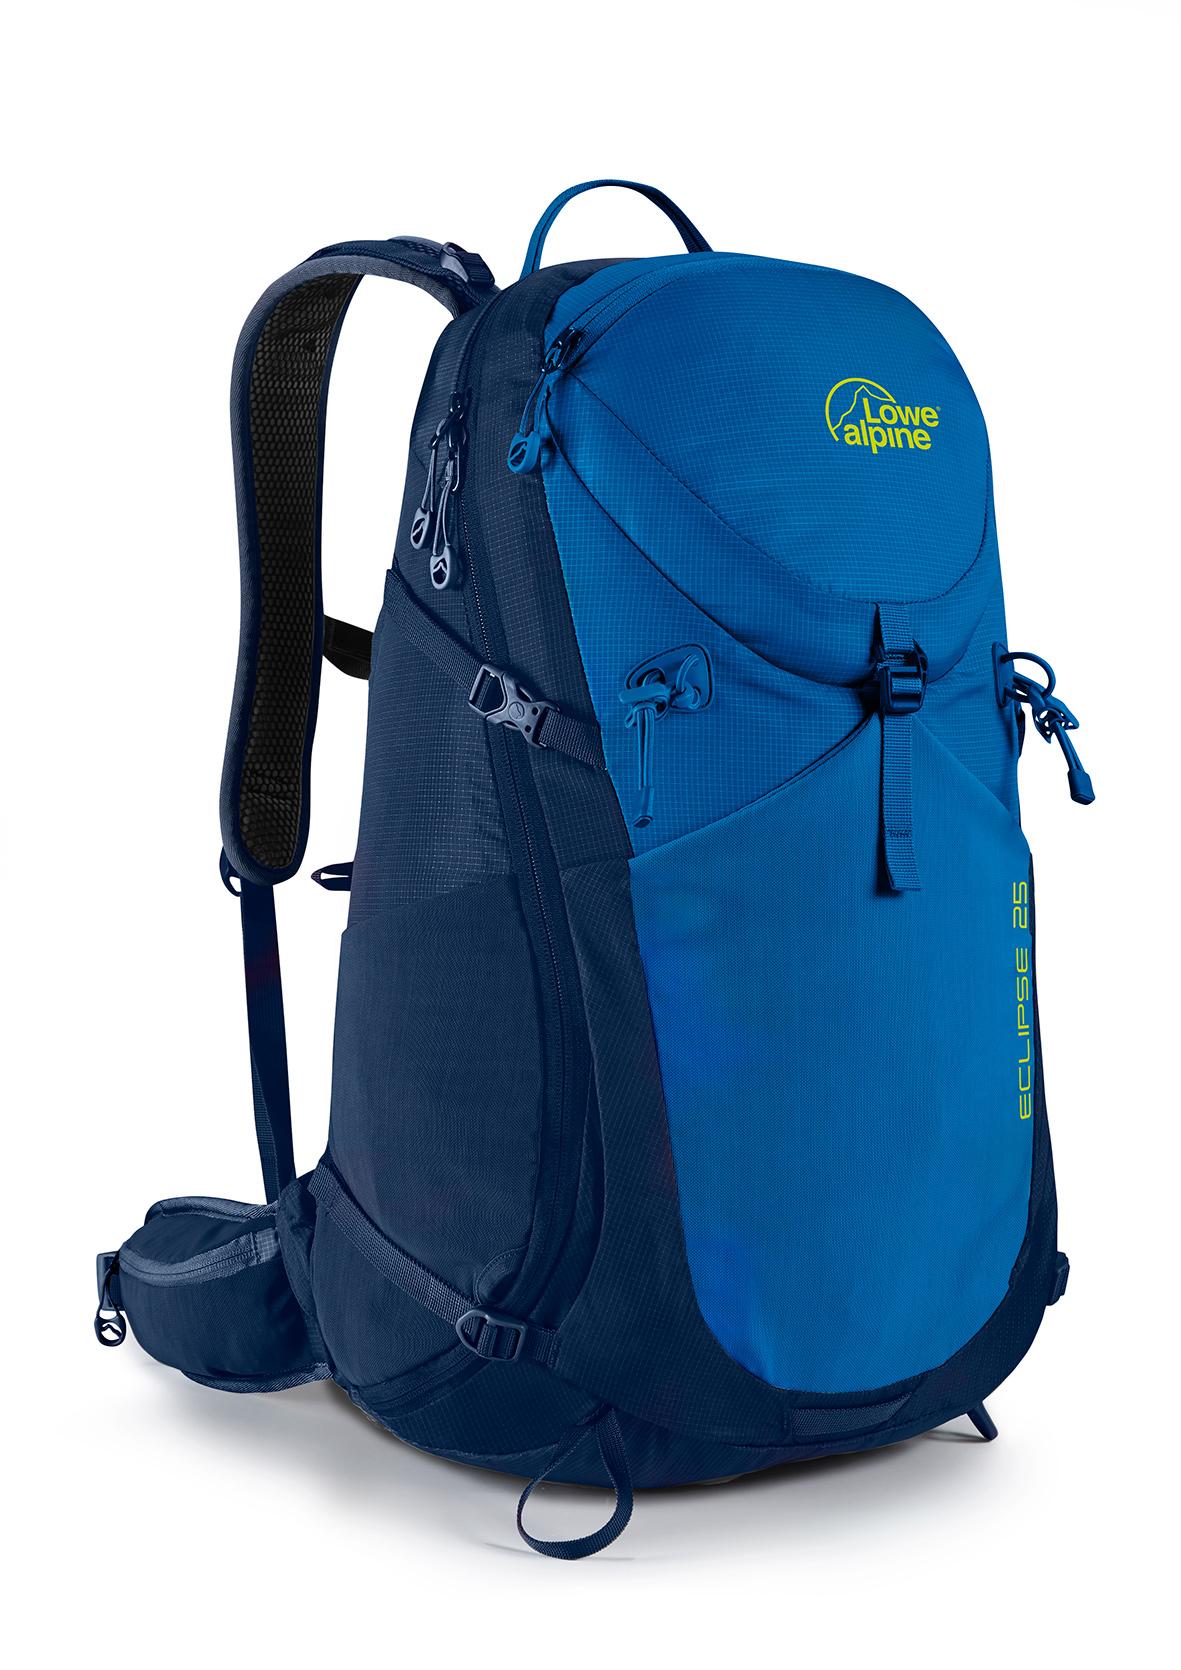 Lowe Alpine Eclipse 25 Backpack 95b1e78b62b29